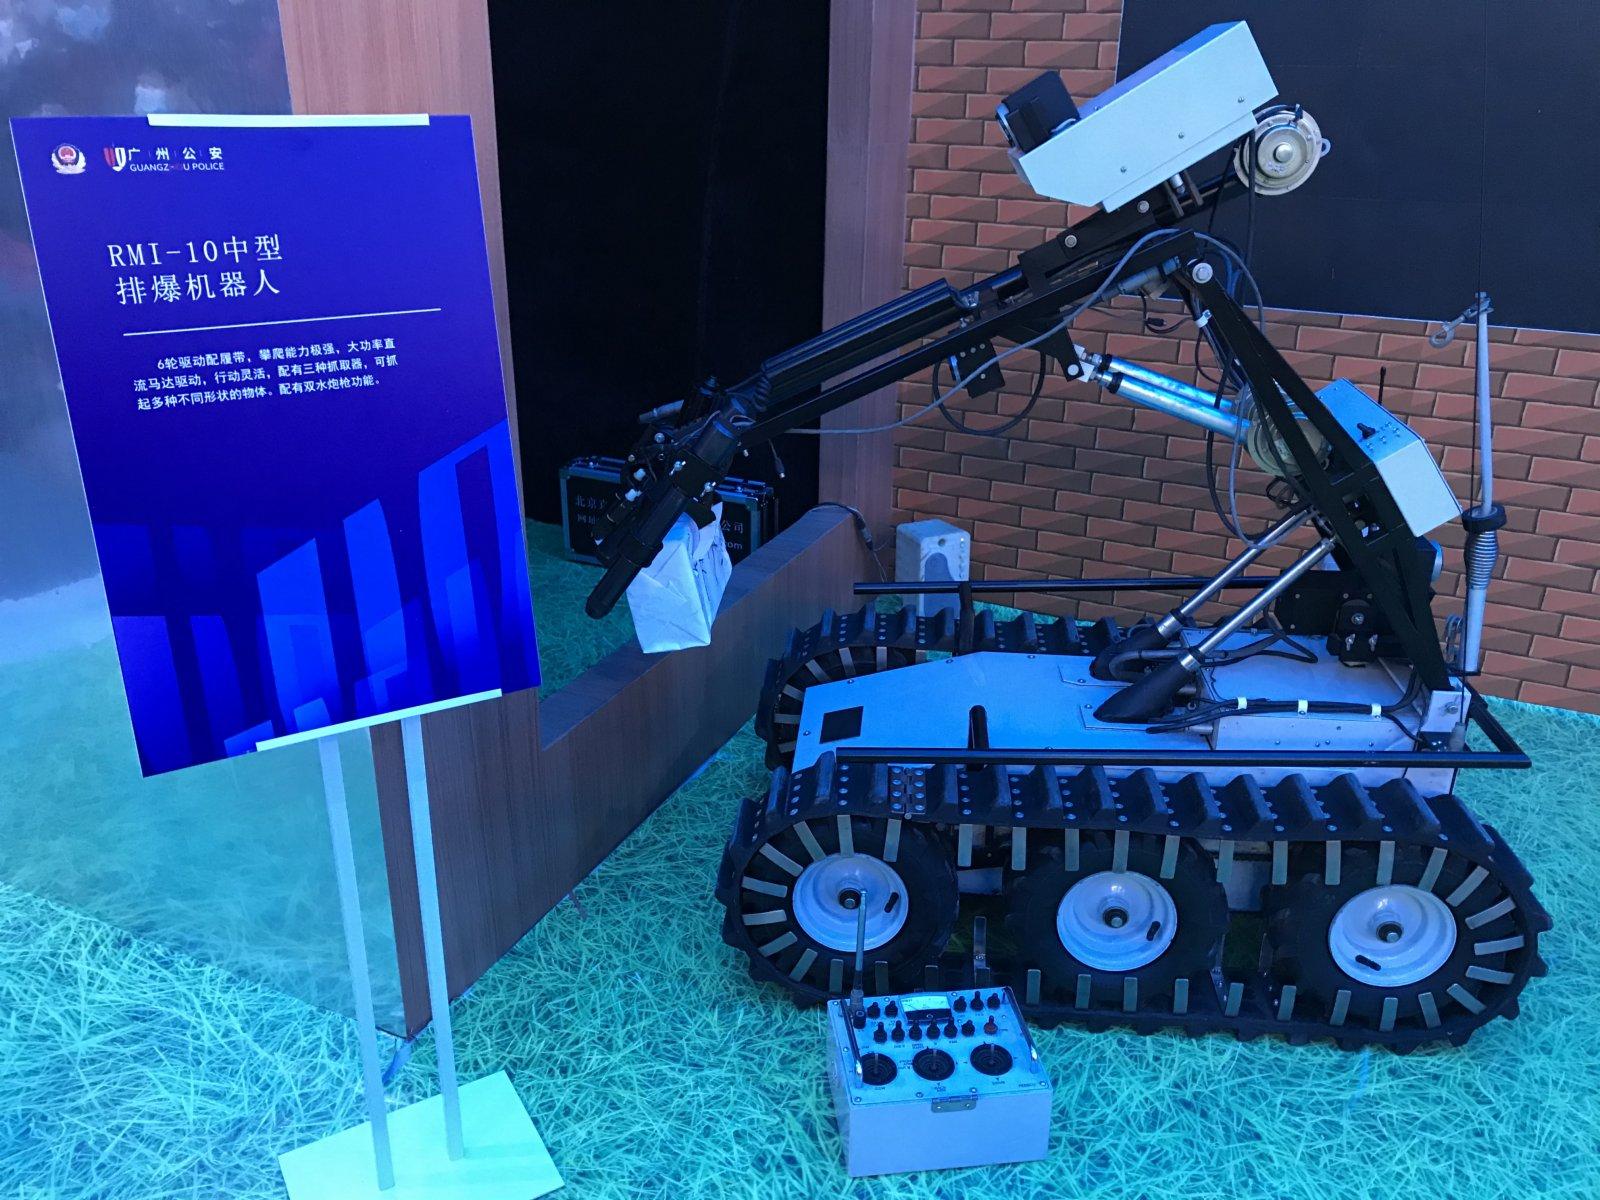 RMI-10中型排爆機器人,配有雙水炮槍功能。記者敖敏輝 攝